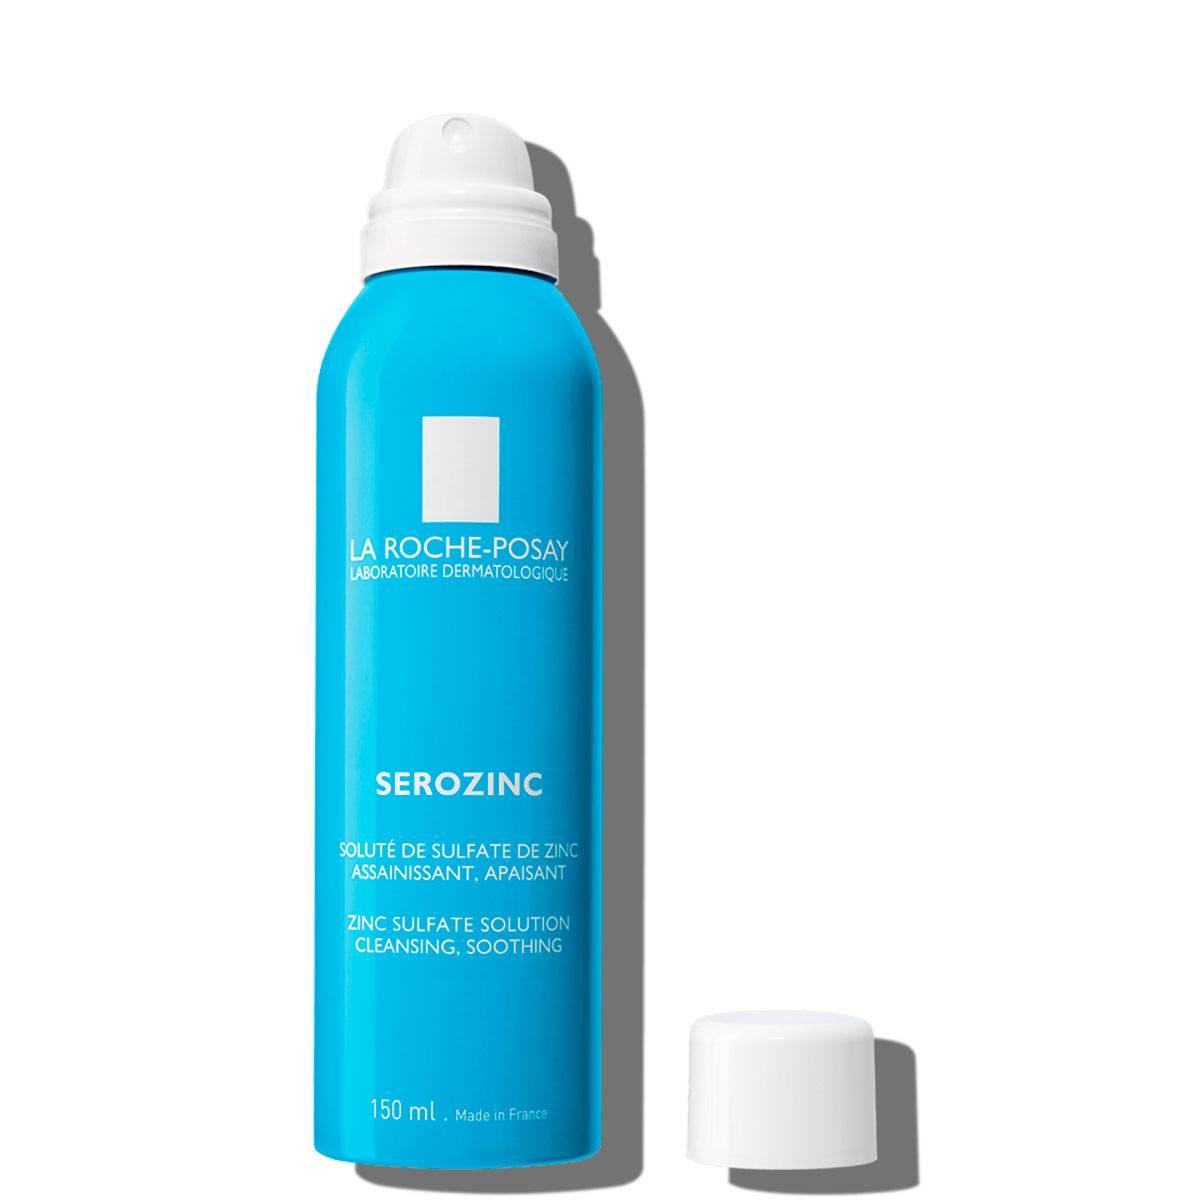 La Roche Posay ProductPage Serozinc Spray Zink 150ml 3433422406728 Ope